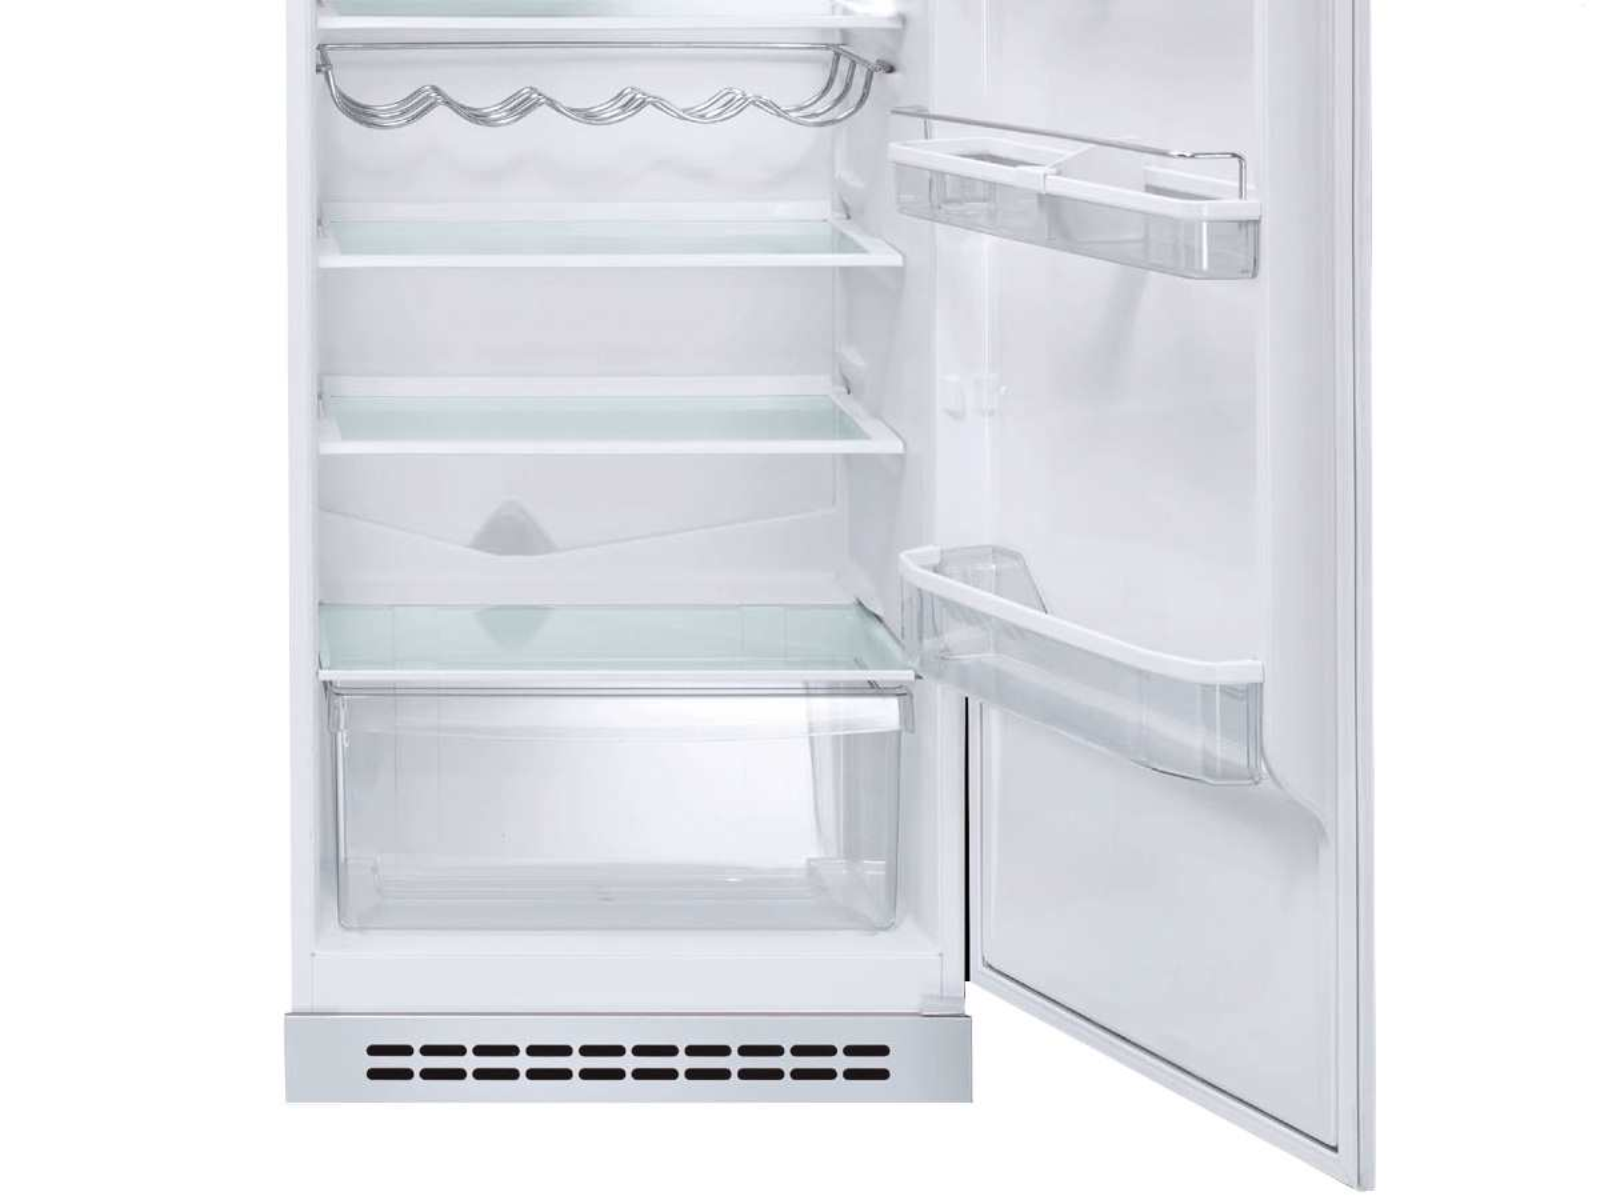 Smeg Kühlschrank Write On Me : Smeg kühlschrank gold grosse khlschrnke ohne gefrierfach fabulous